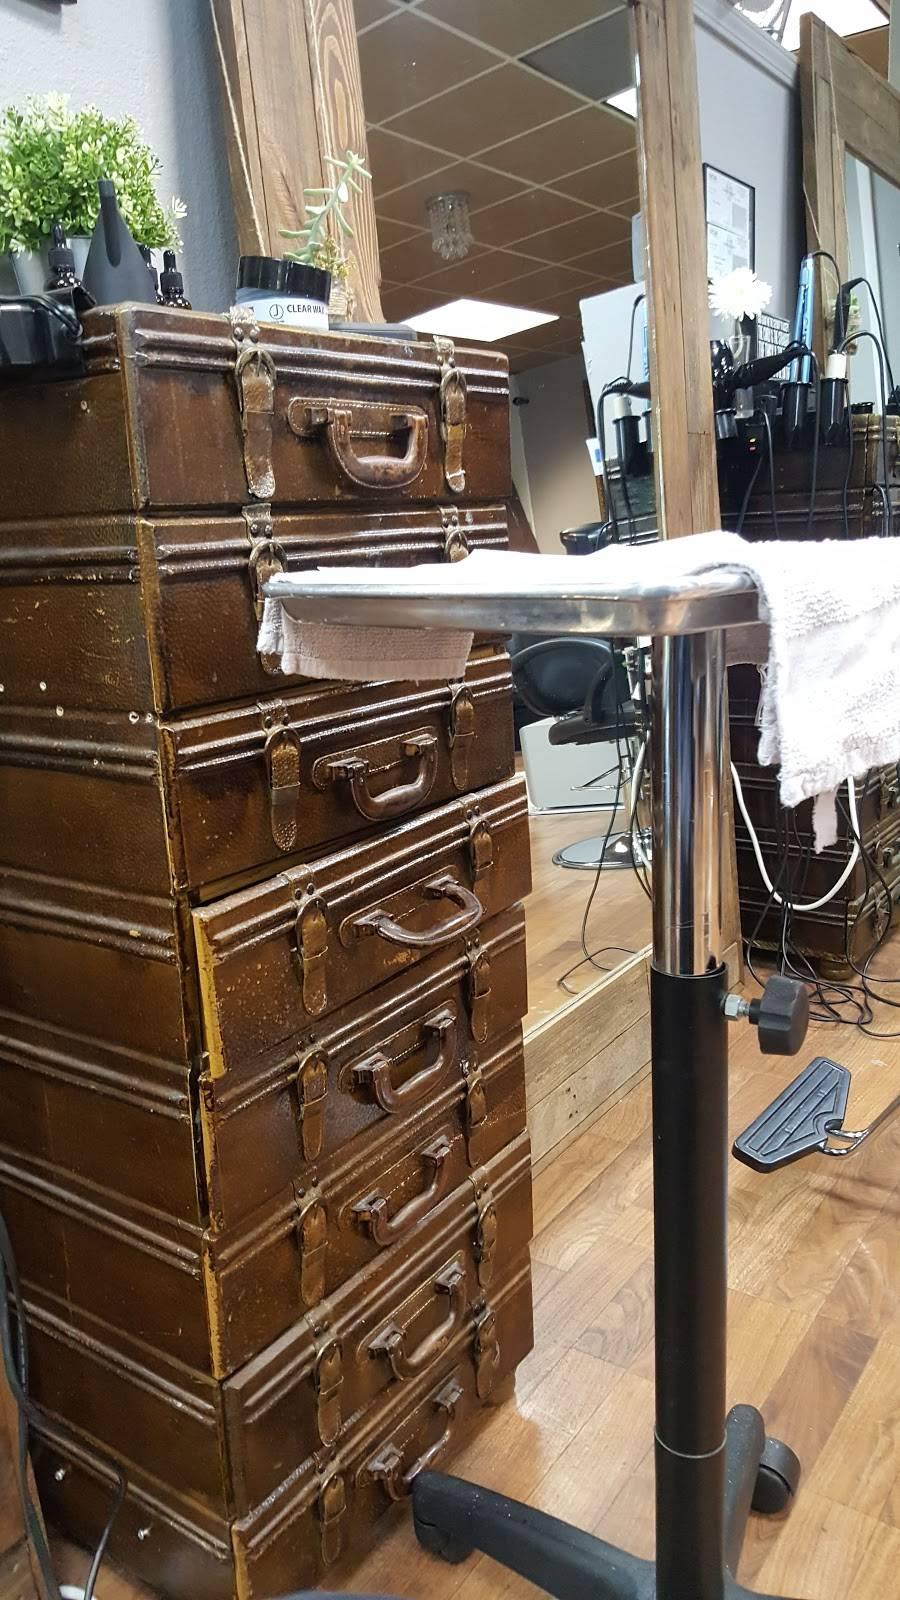 Vandelay Hair Industries Midtown - hair care  | Photo 8 of 10 | Address: 1430 20th St, Sacramento, CA 95811, USA | Phone: (916) 247-6920